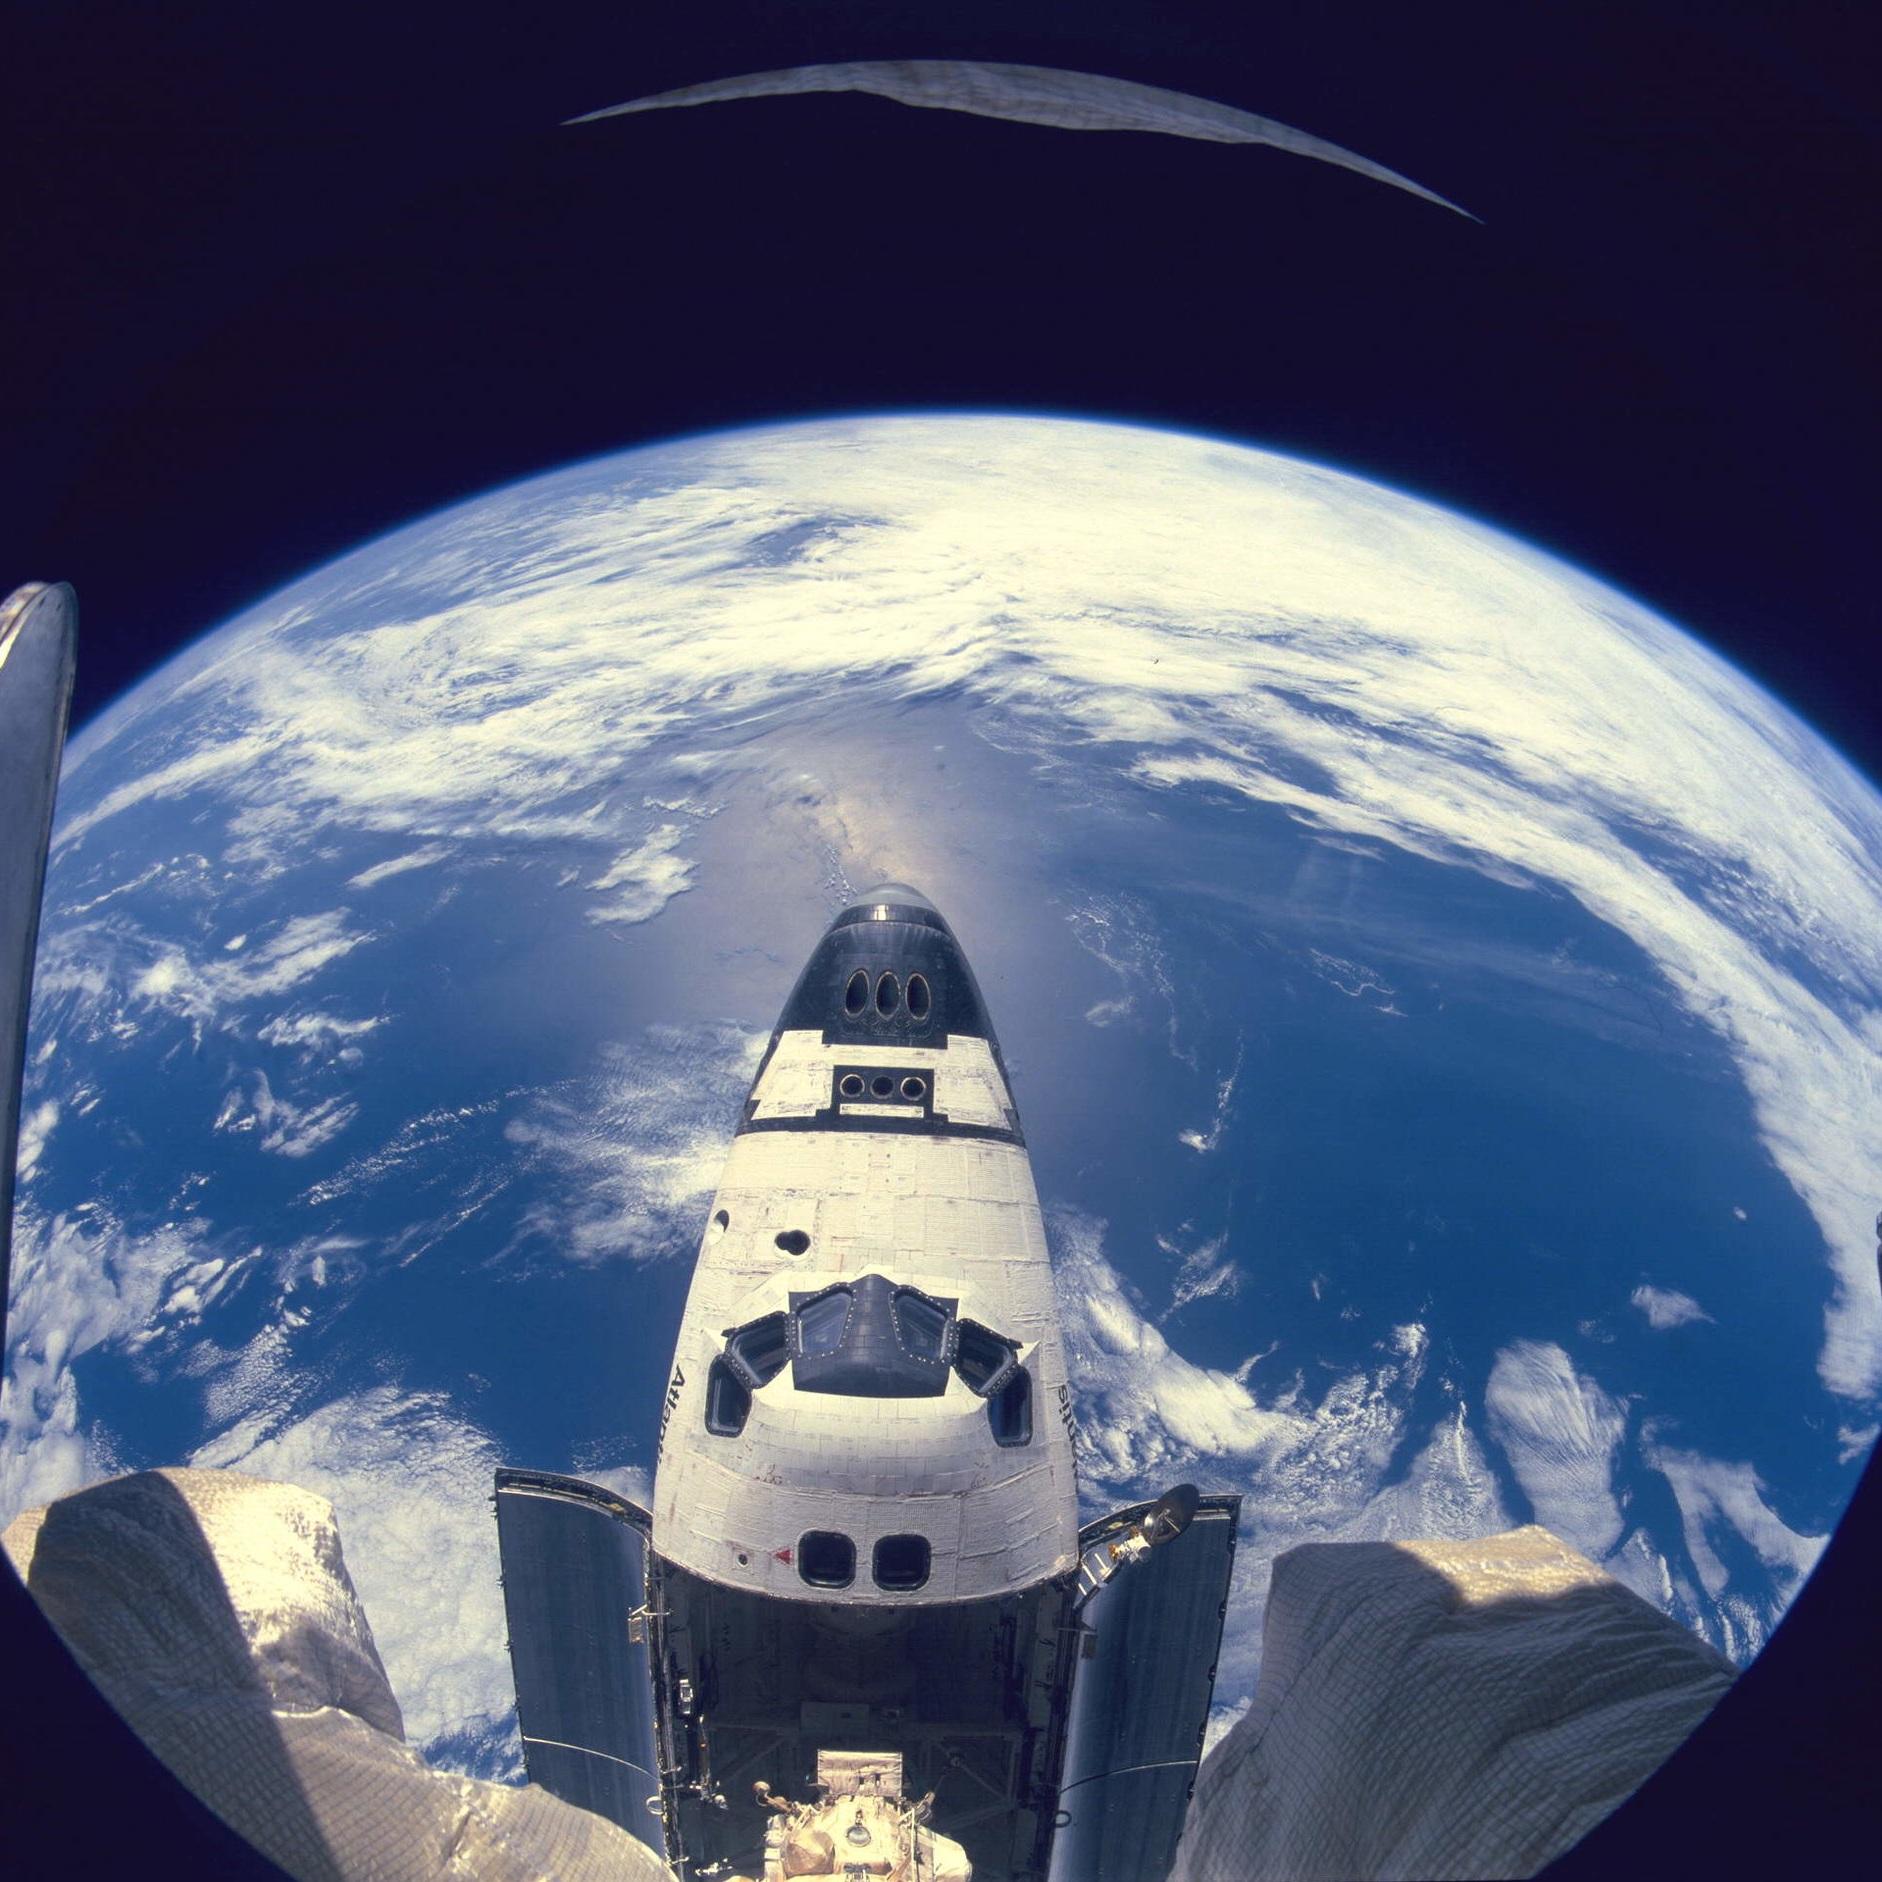 Earth_&_Atlantis_(STS-71).jpg